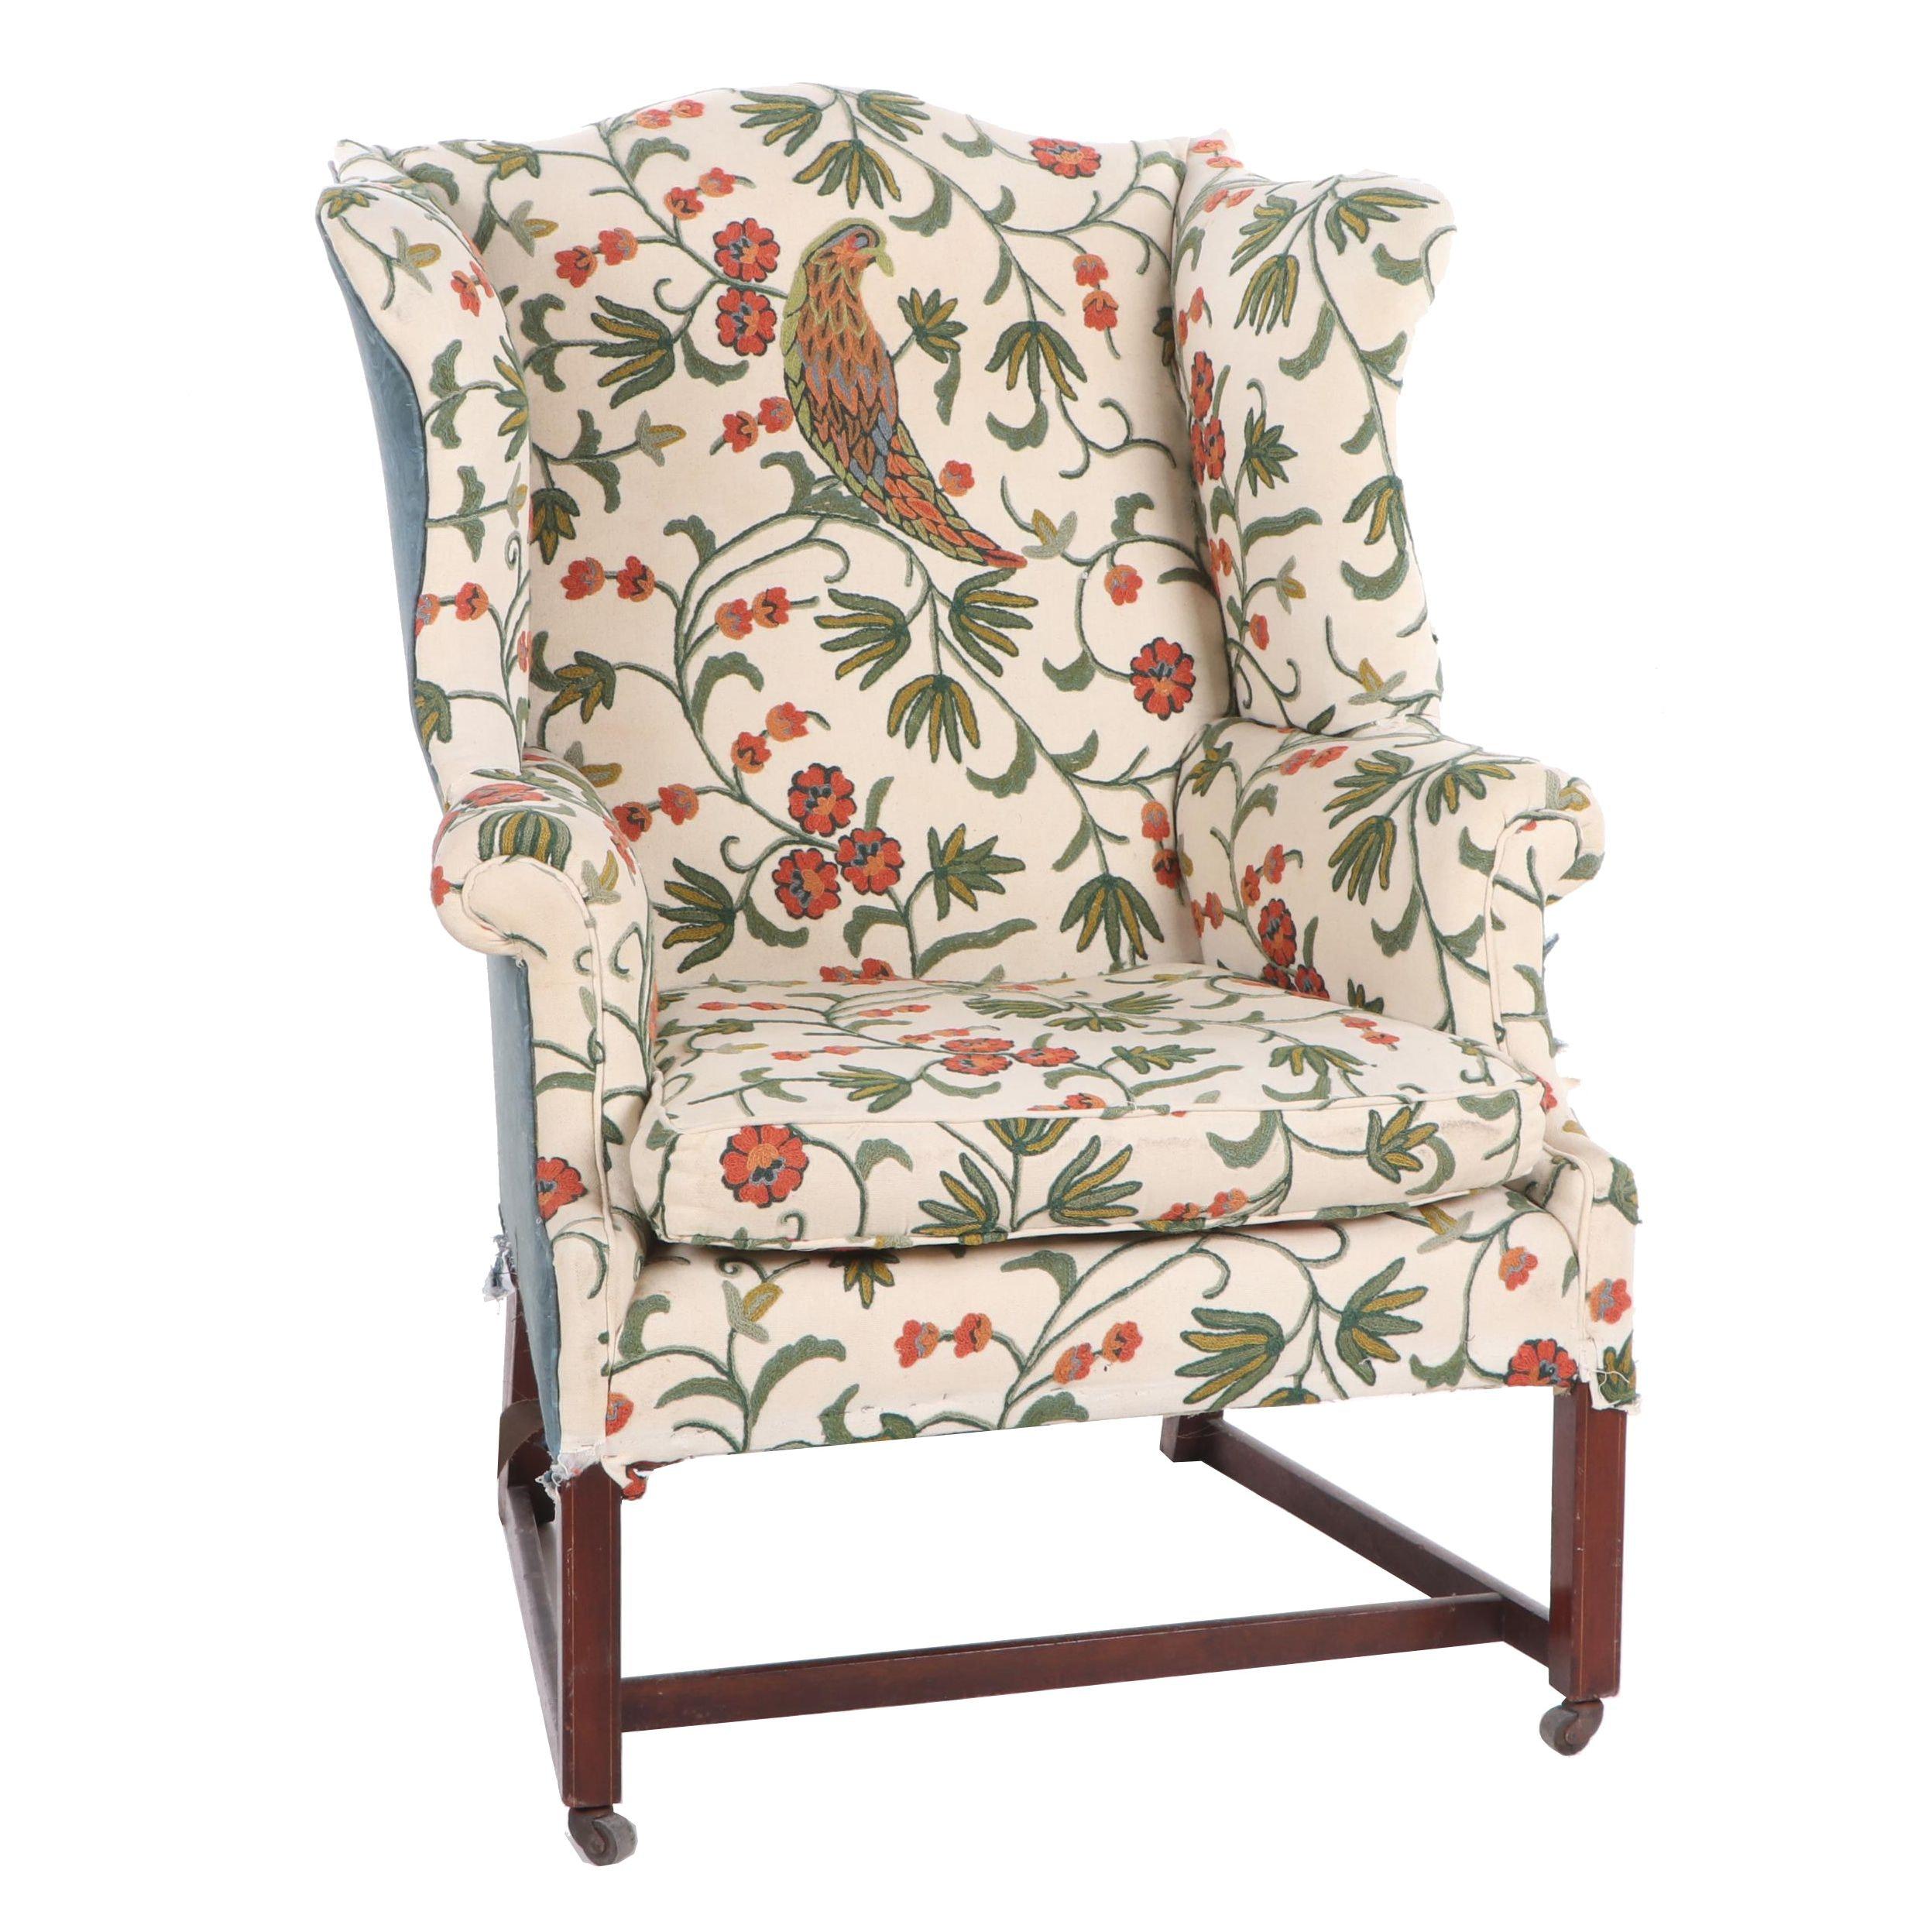 Chippendale Mahogany Wingback Chair, Massachusetts, Ca. 1780